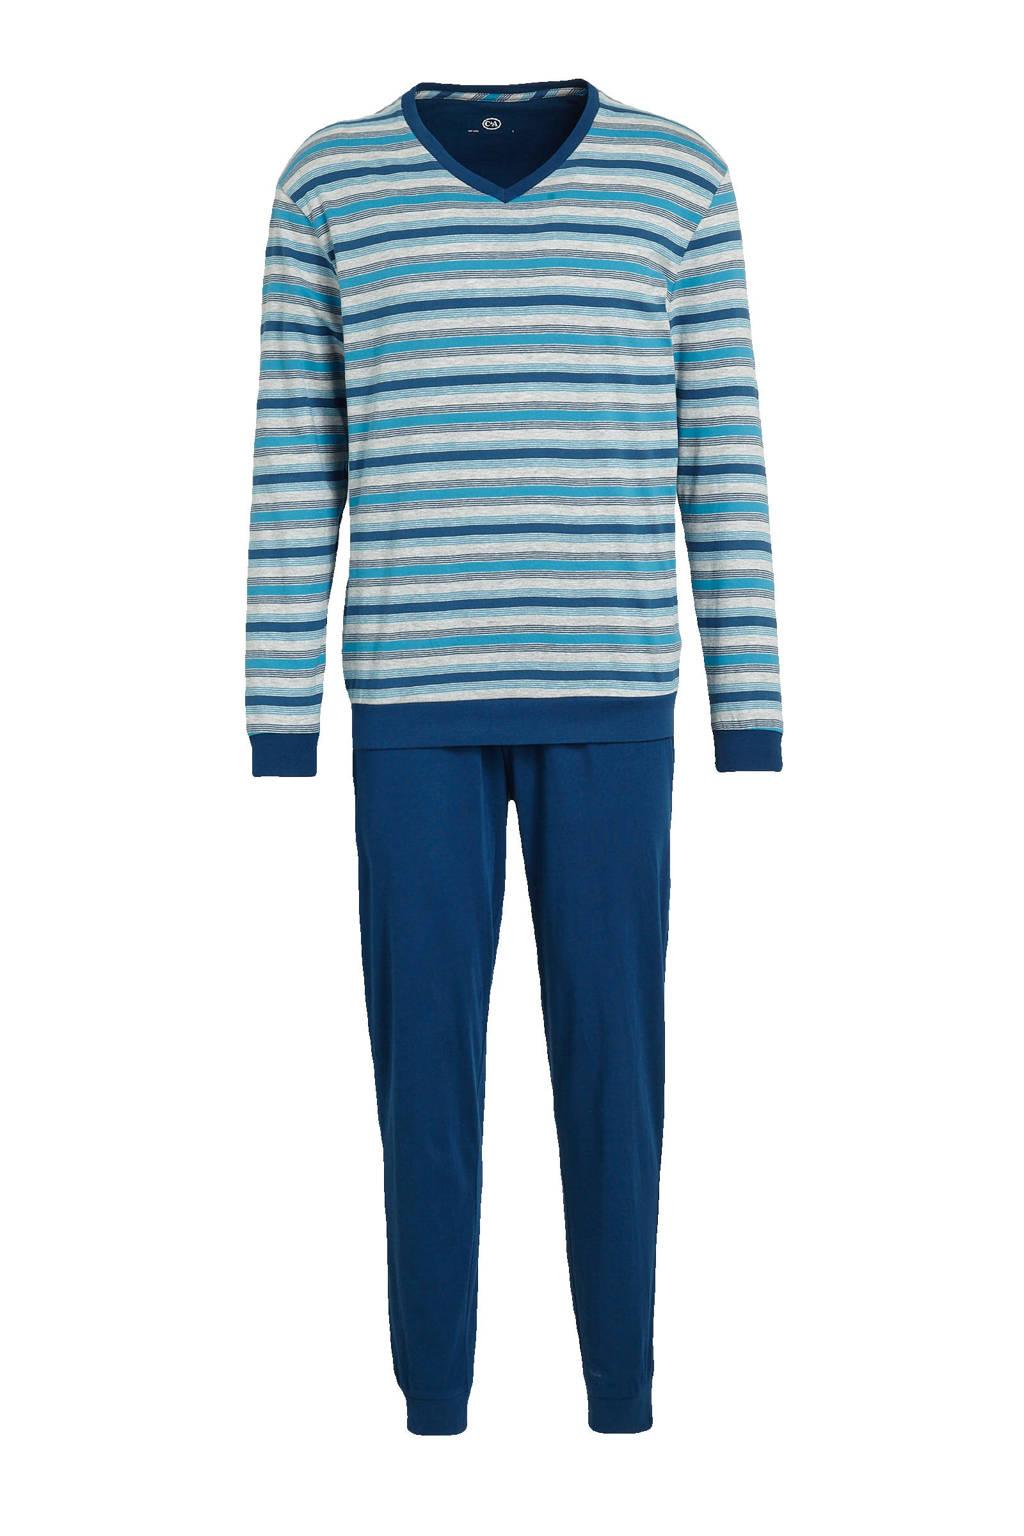 C&A Canda pyjama met strepen blauw, Donkerblauw